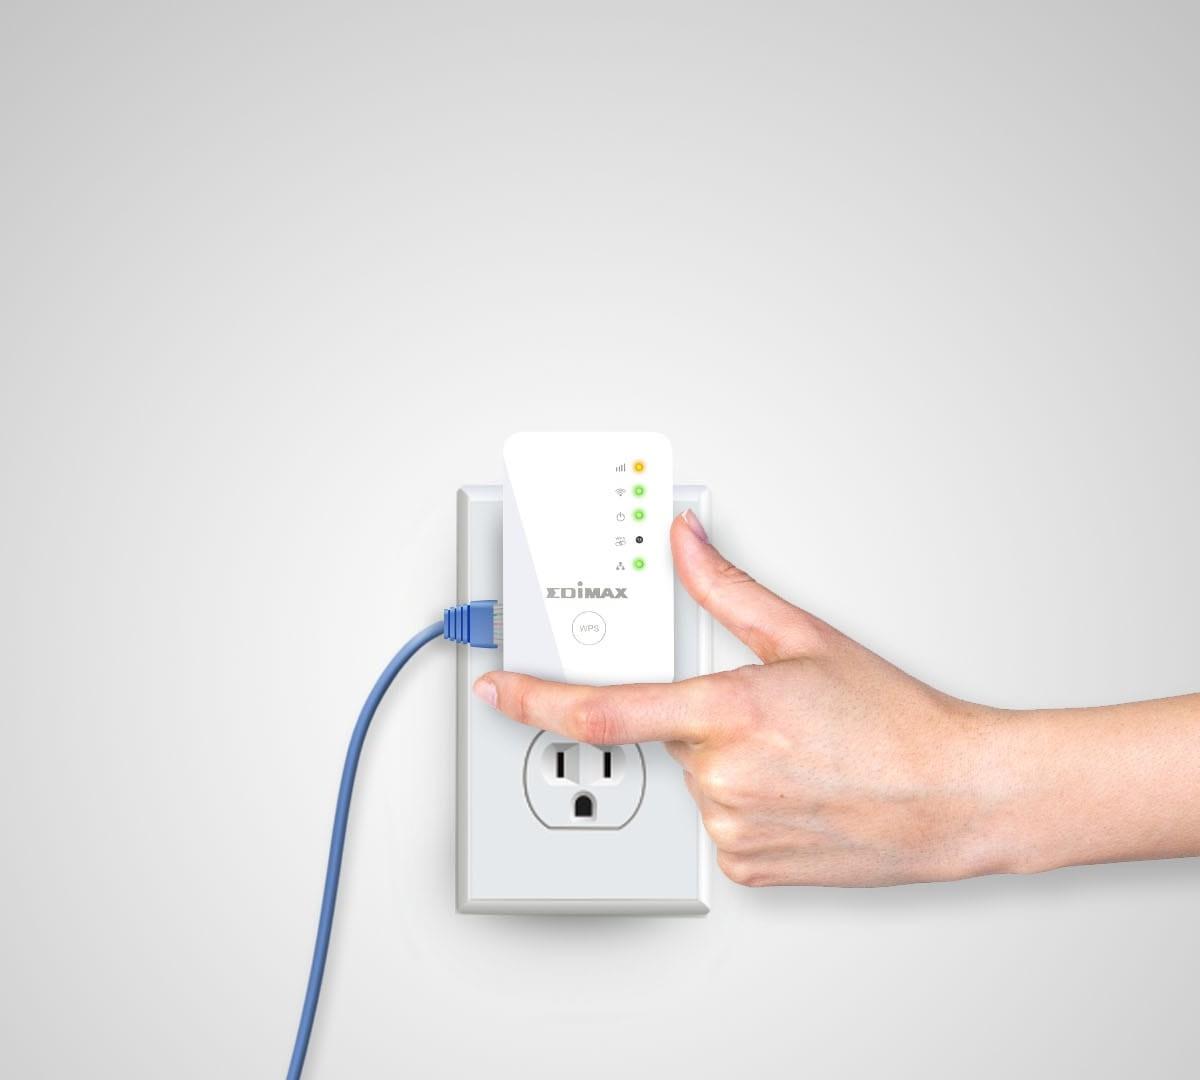 Edimax EW-7438RPn Mini compact Wi-Fi range extender improves your internet signal